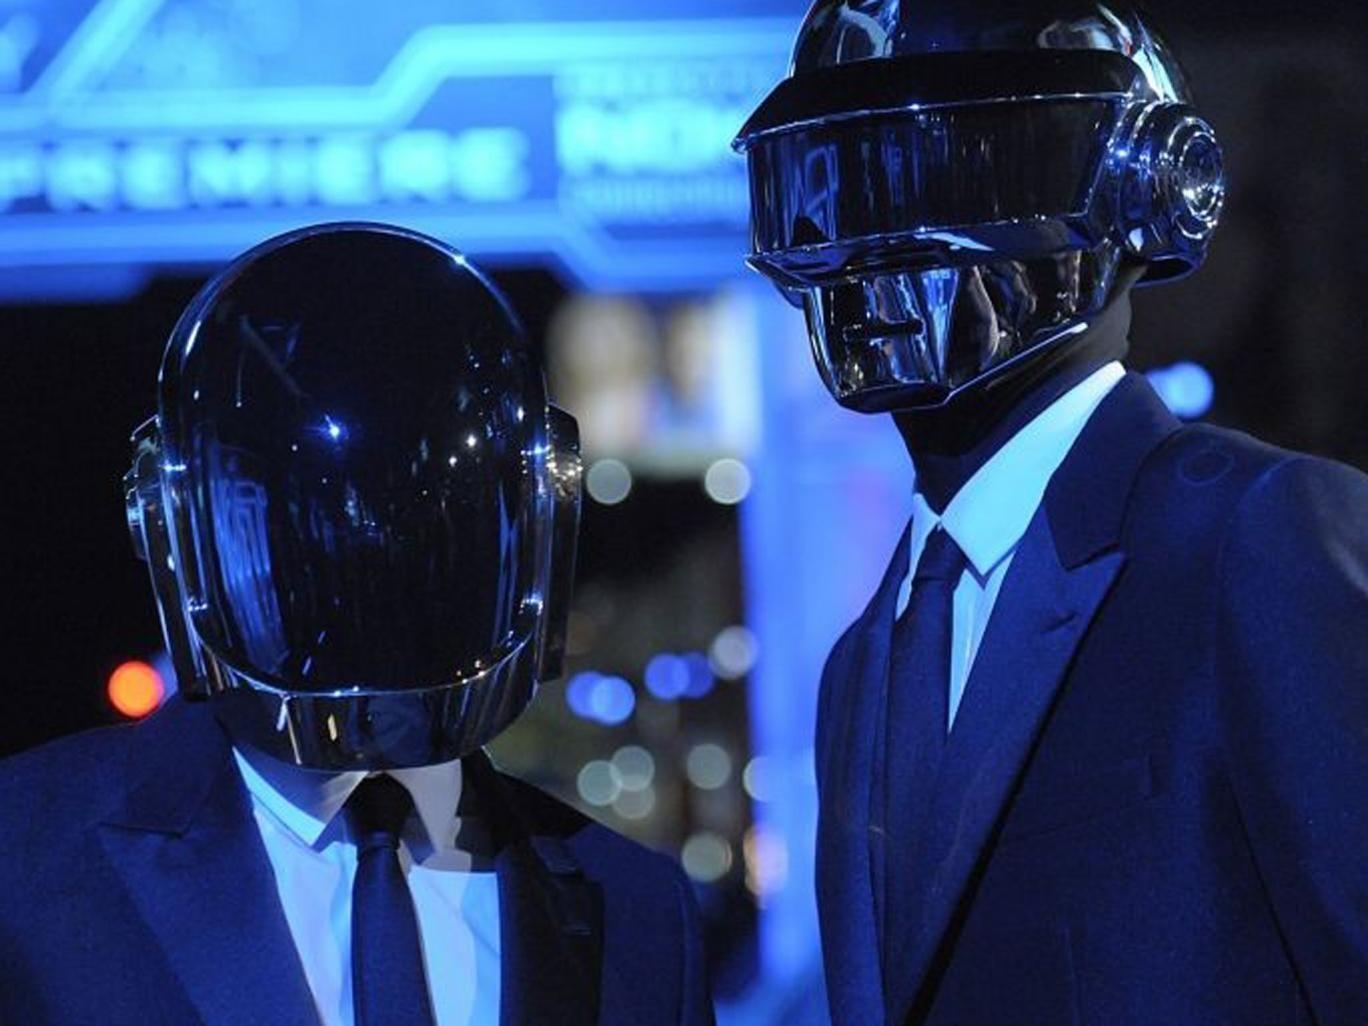 Daft Punk, Random Access Memories (Sony Music)